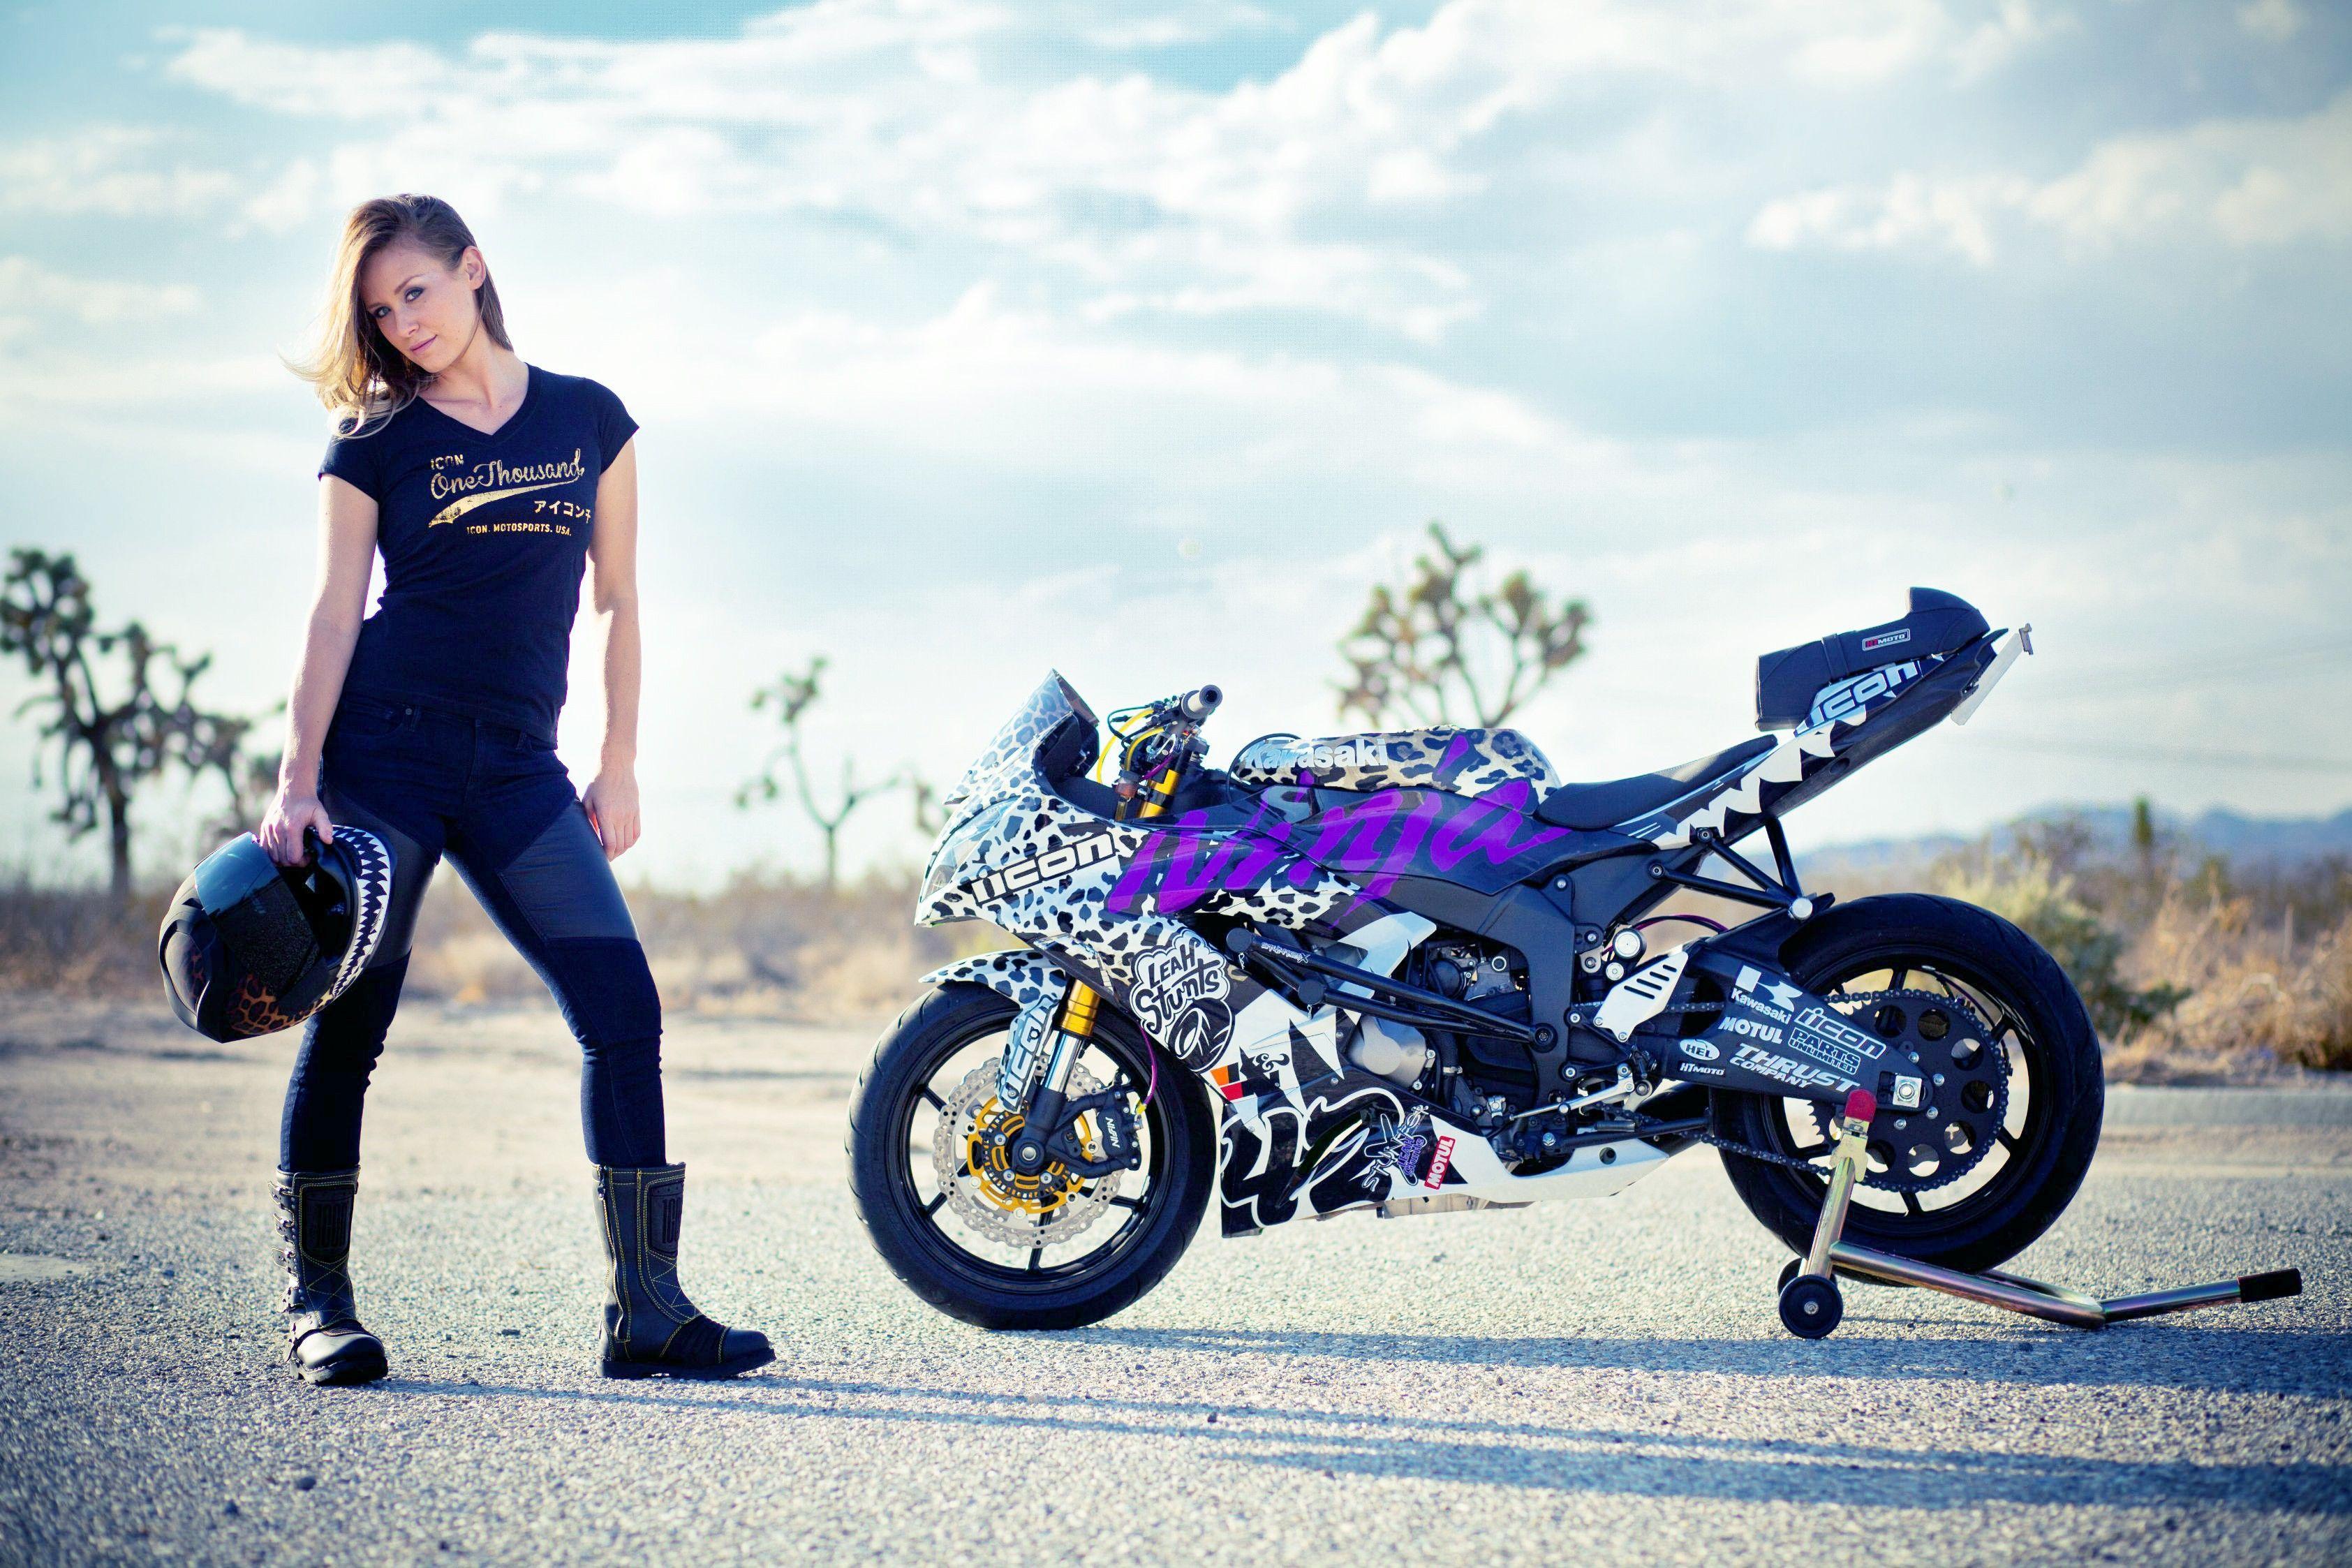 Bike Girl Wallpapers Top Free Bike Girl Backgrounds Wallpaperaccess